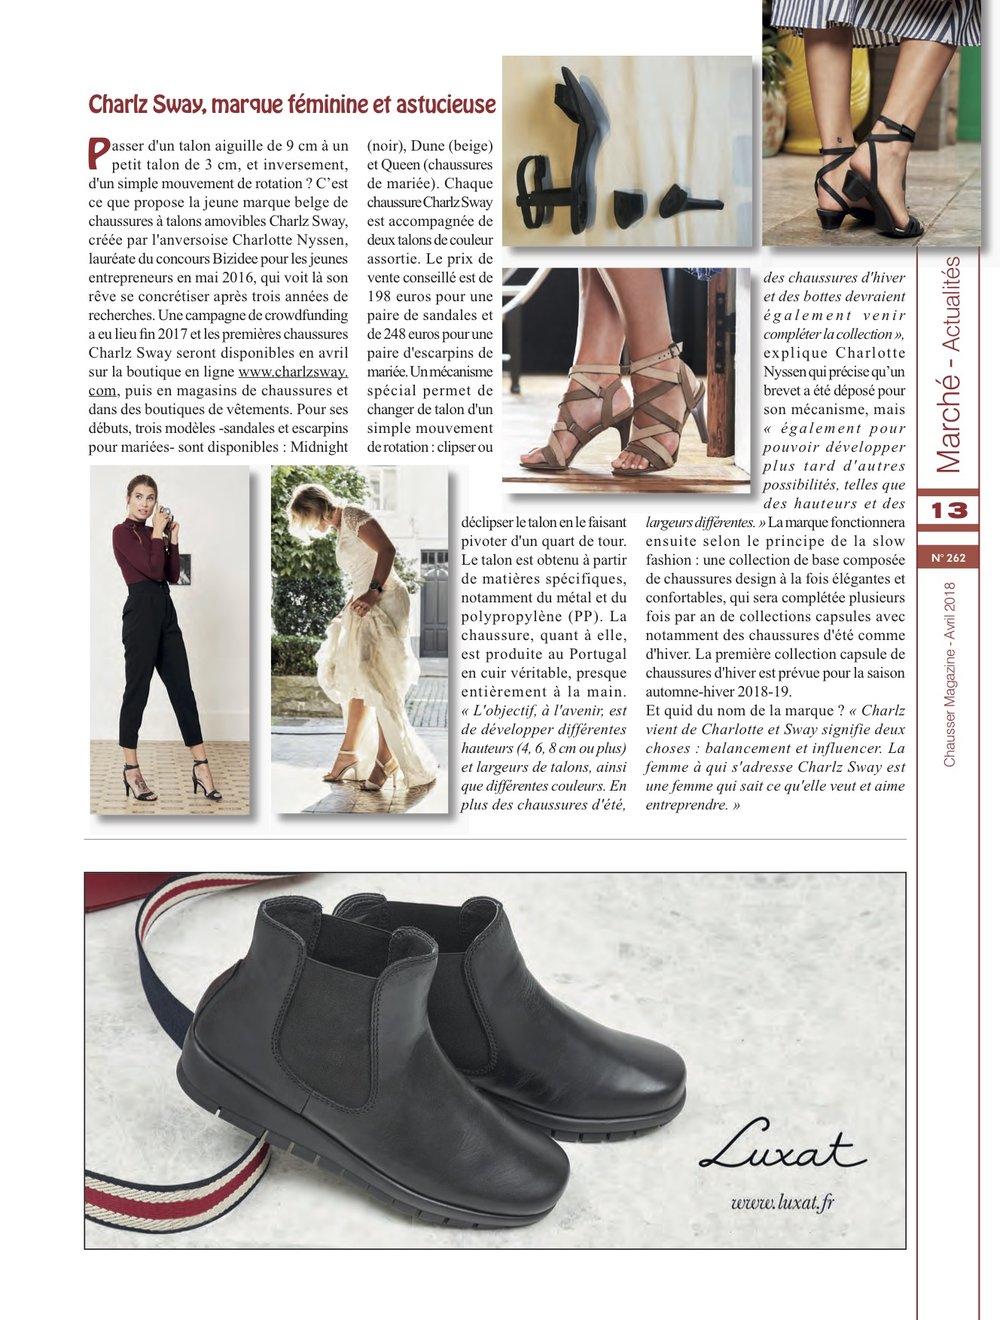 Chausser Magazine Avril 2018 - Charlz Sway.jpg